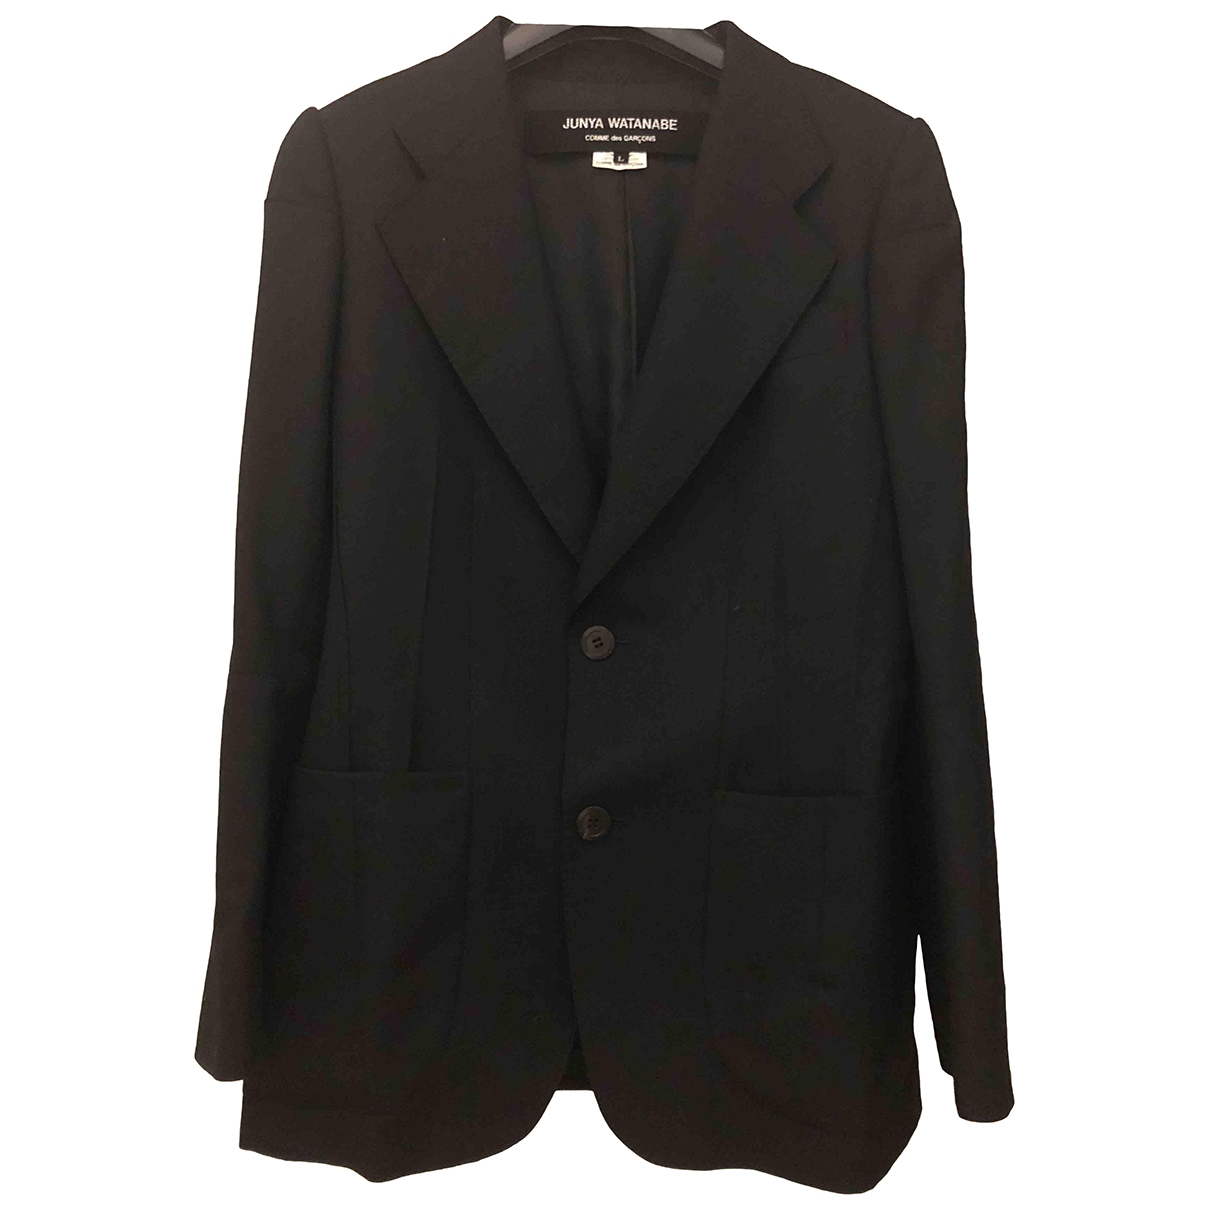 Junya Watanabe \N Black Wool jacket for Women L International